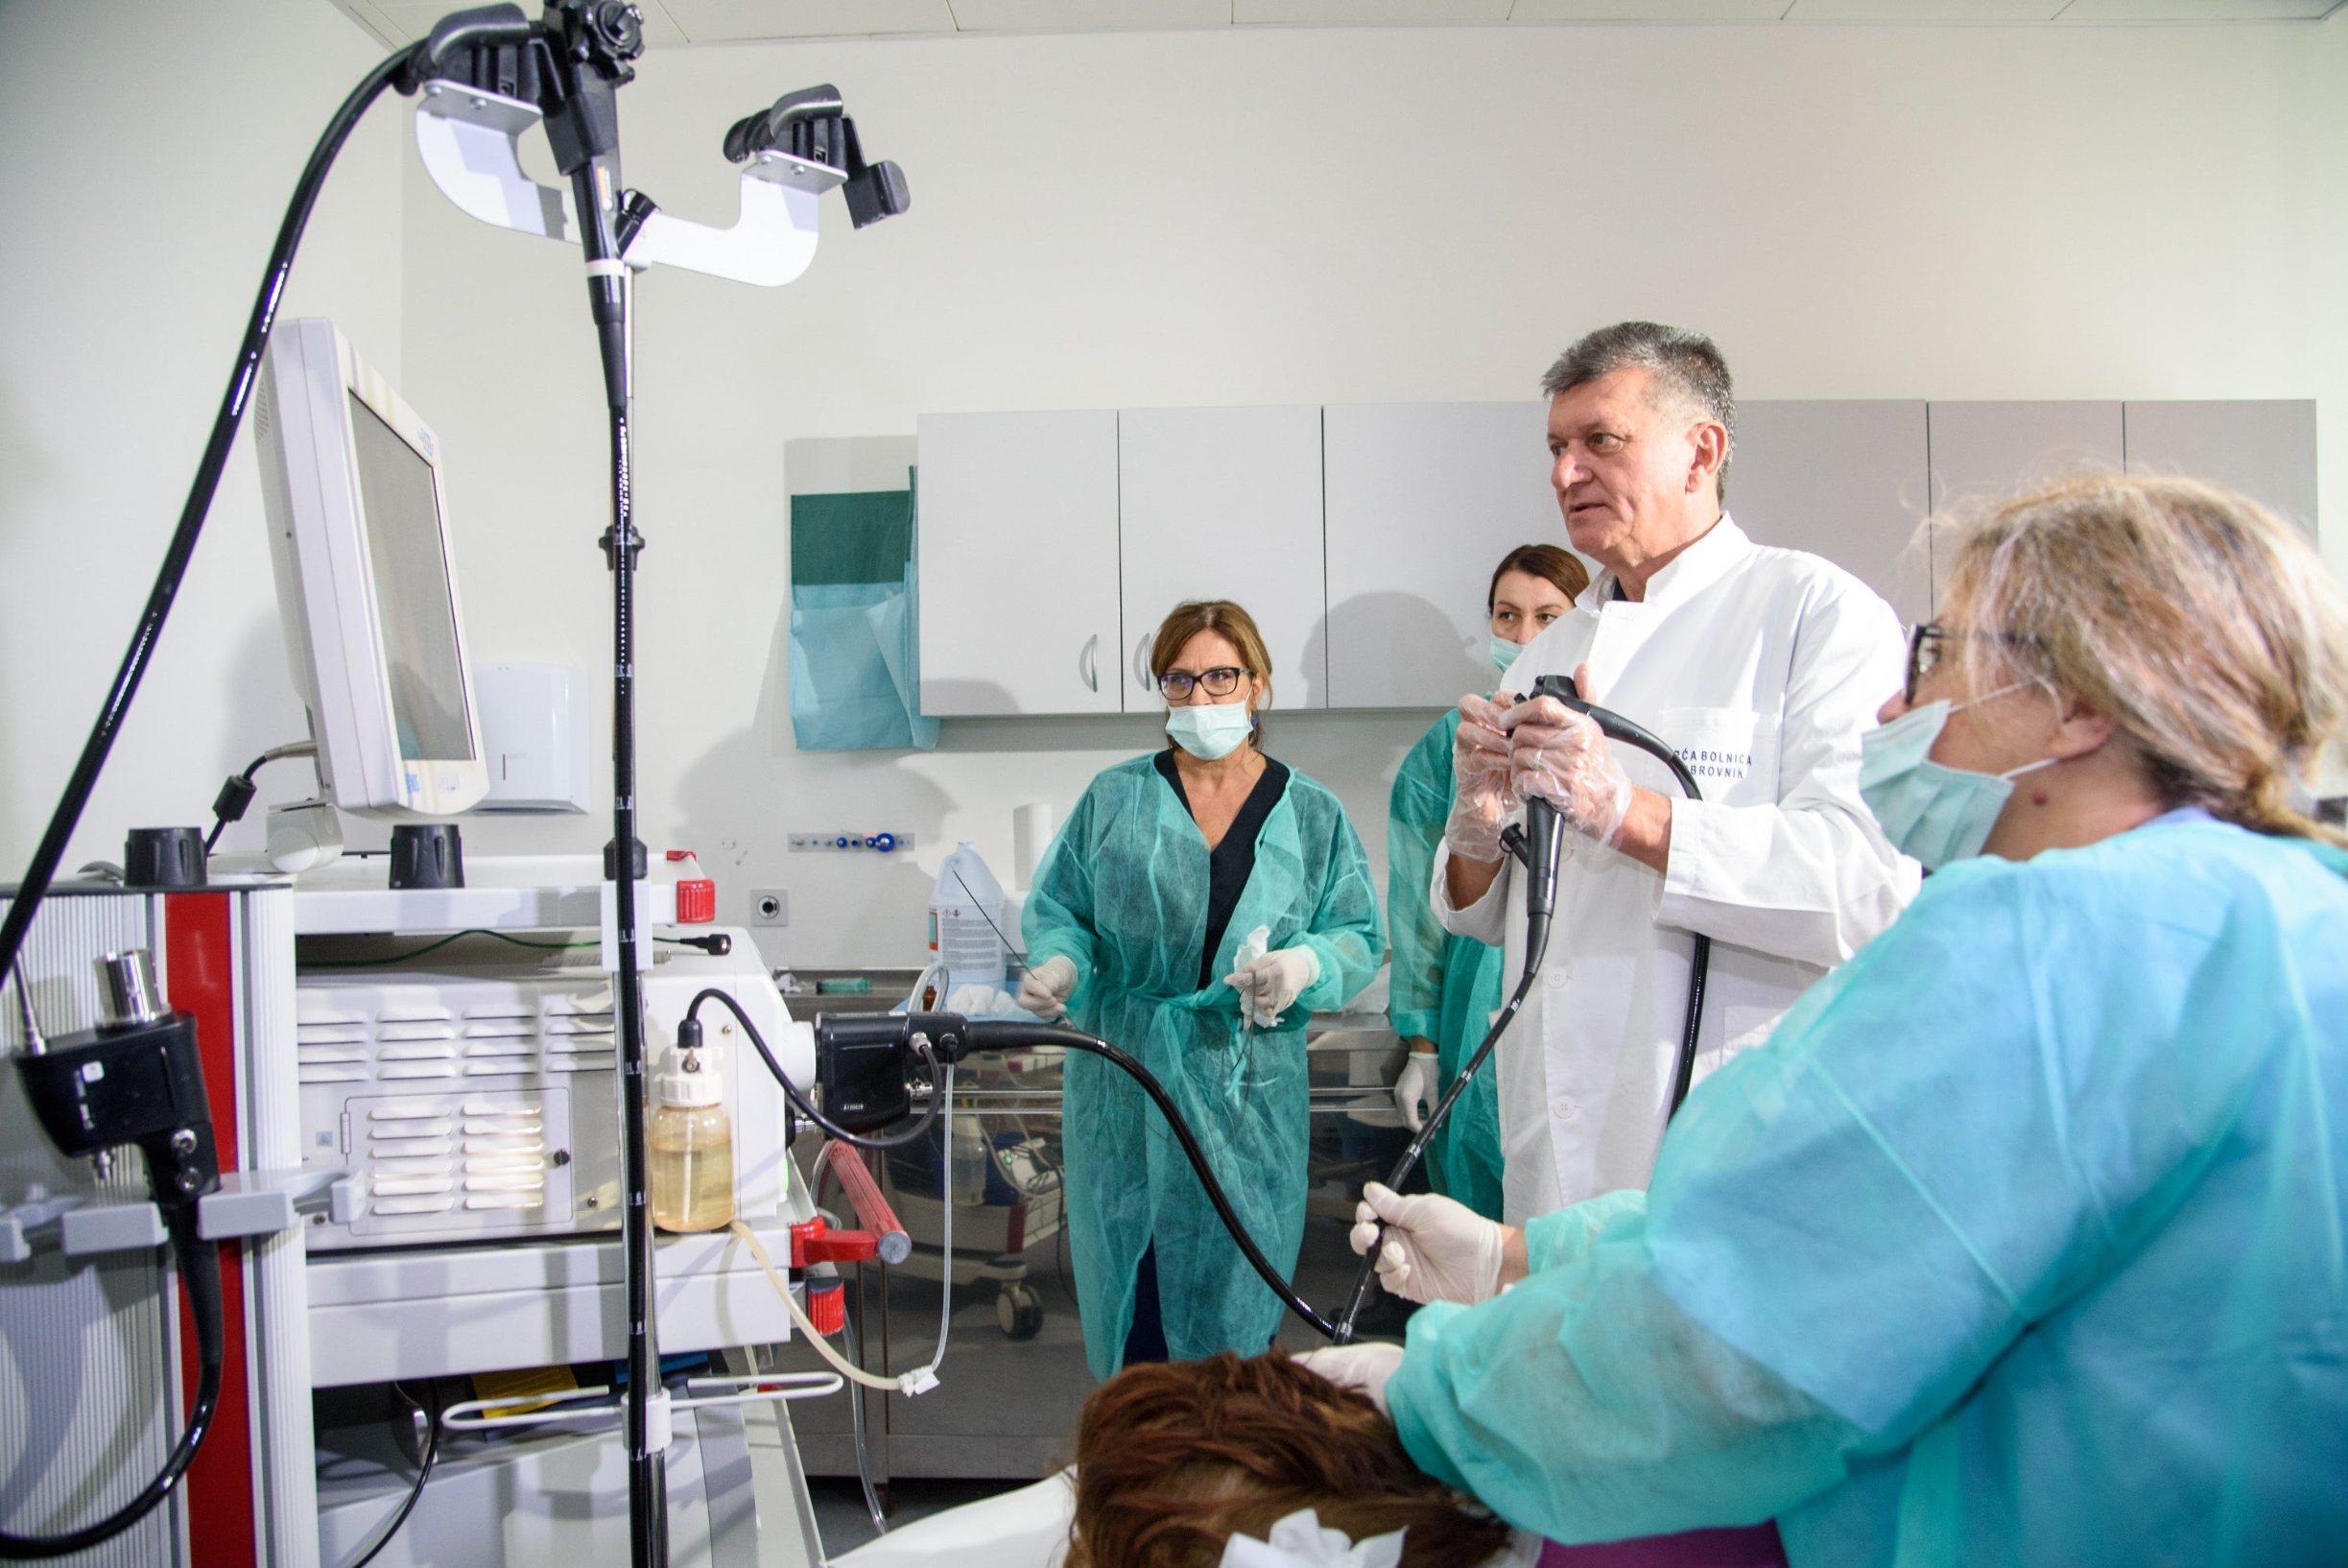 Dubrovnik, 251019. Ministar zdravstva prof.dr.sc. Milan Kujundzic posjetio je danas opcu bolnicu Dubrovnik. Foto: Tonci Plazibat / CROPIX